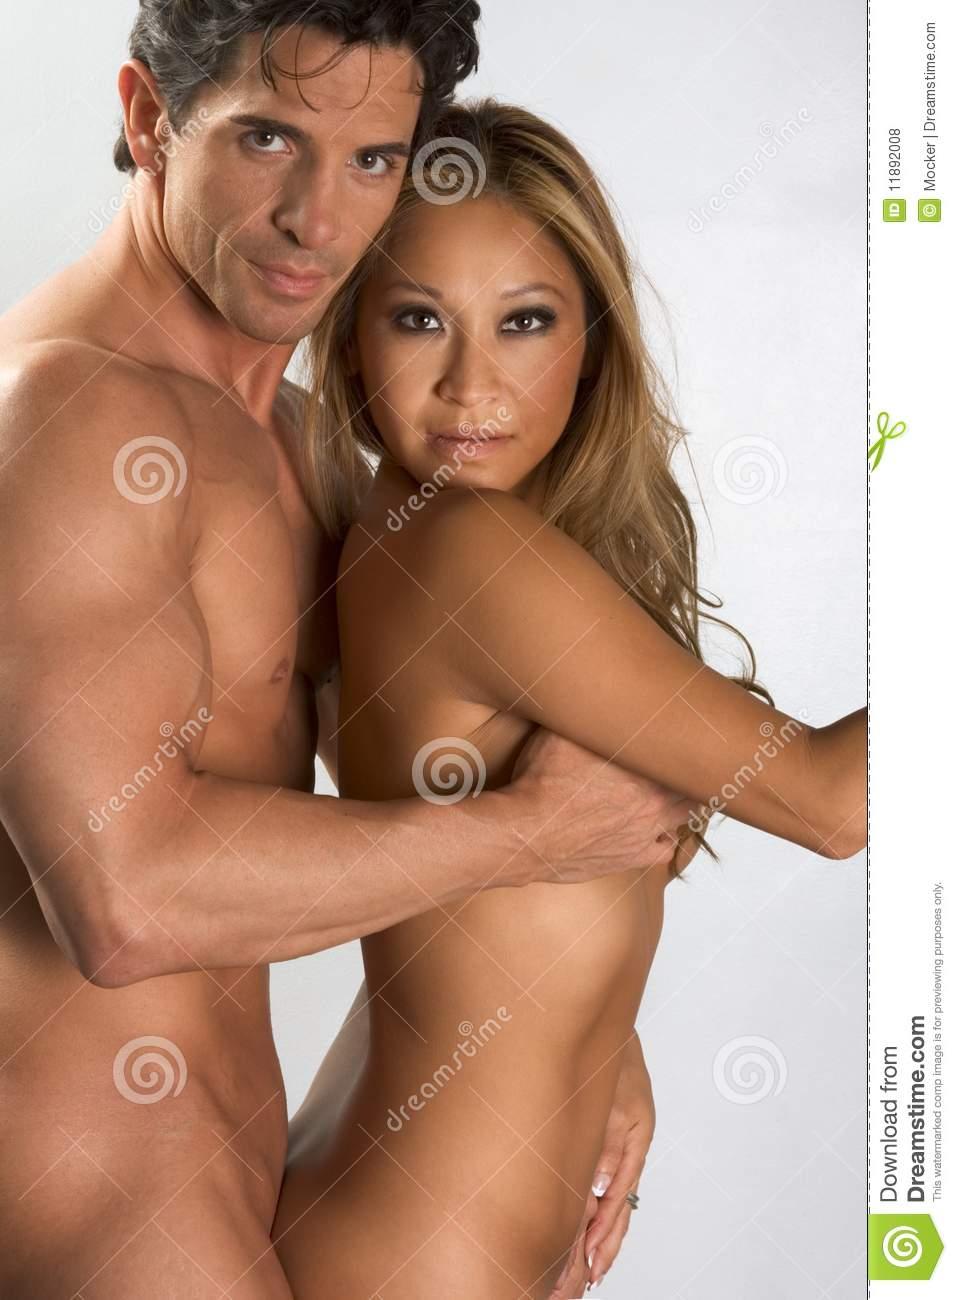 Interracial nude art couples sex